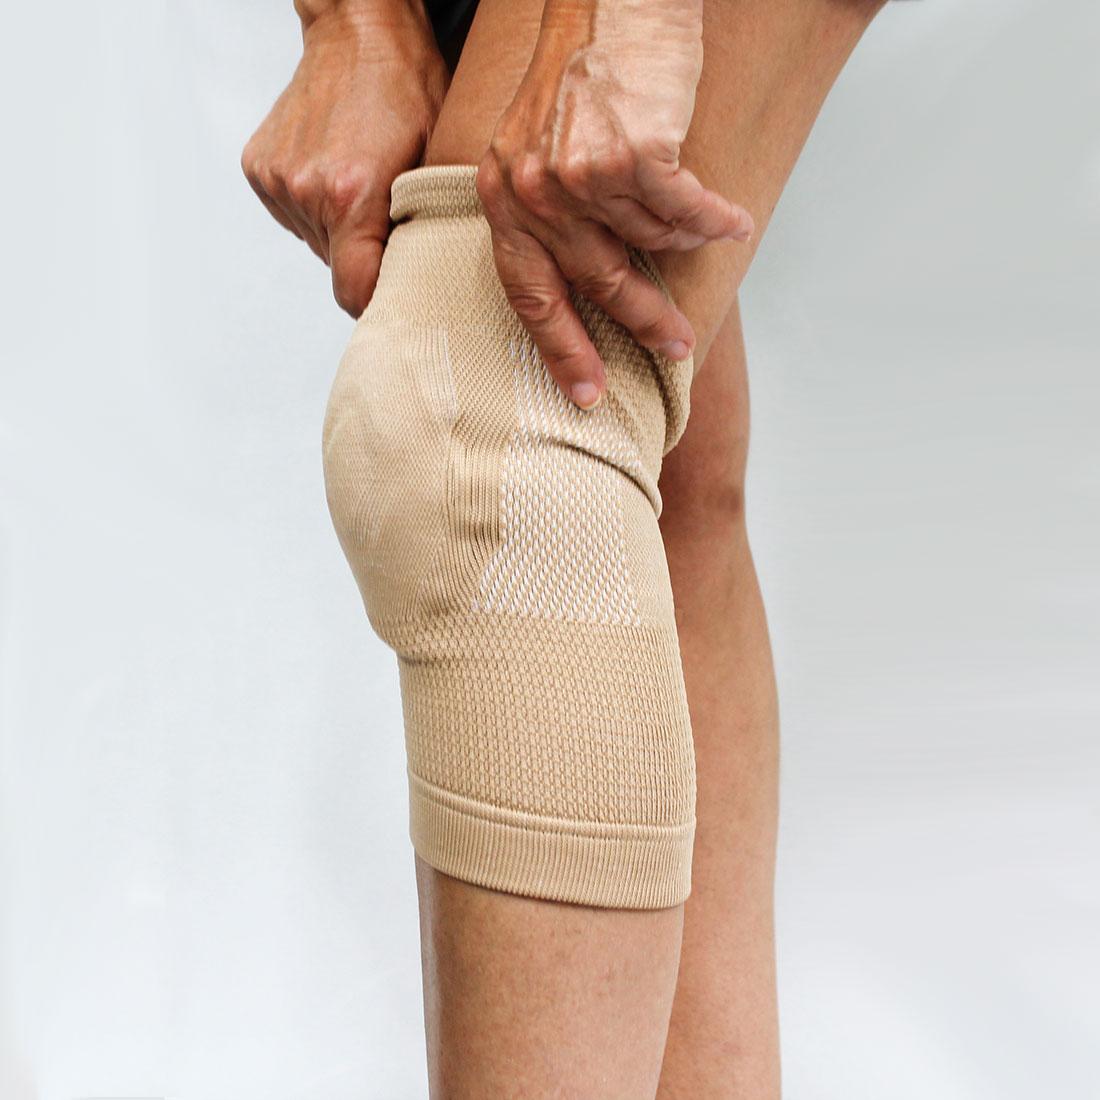 Бандаж для колена, женский [06749],